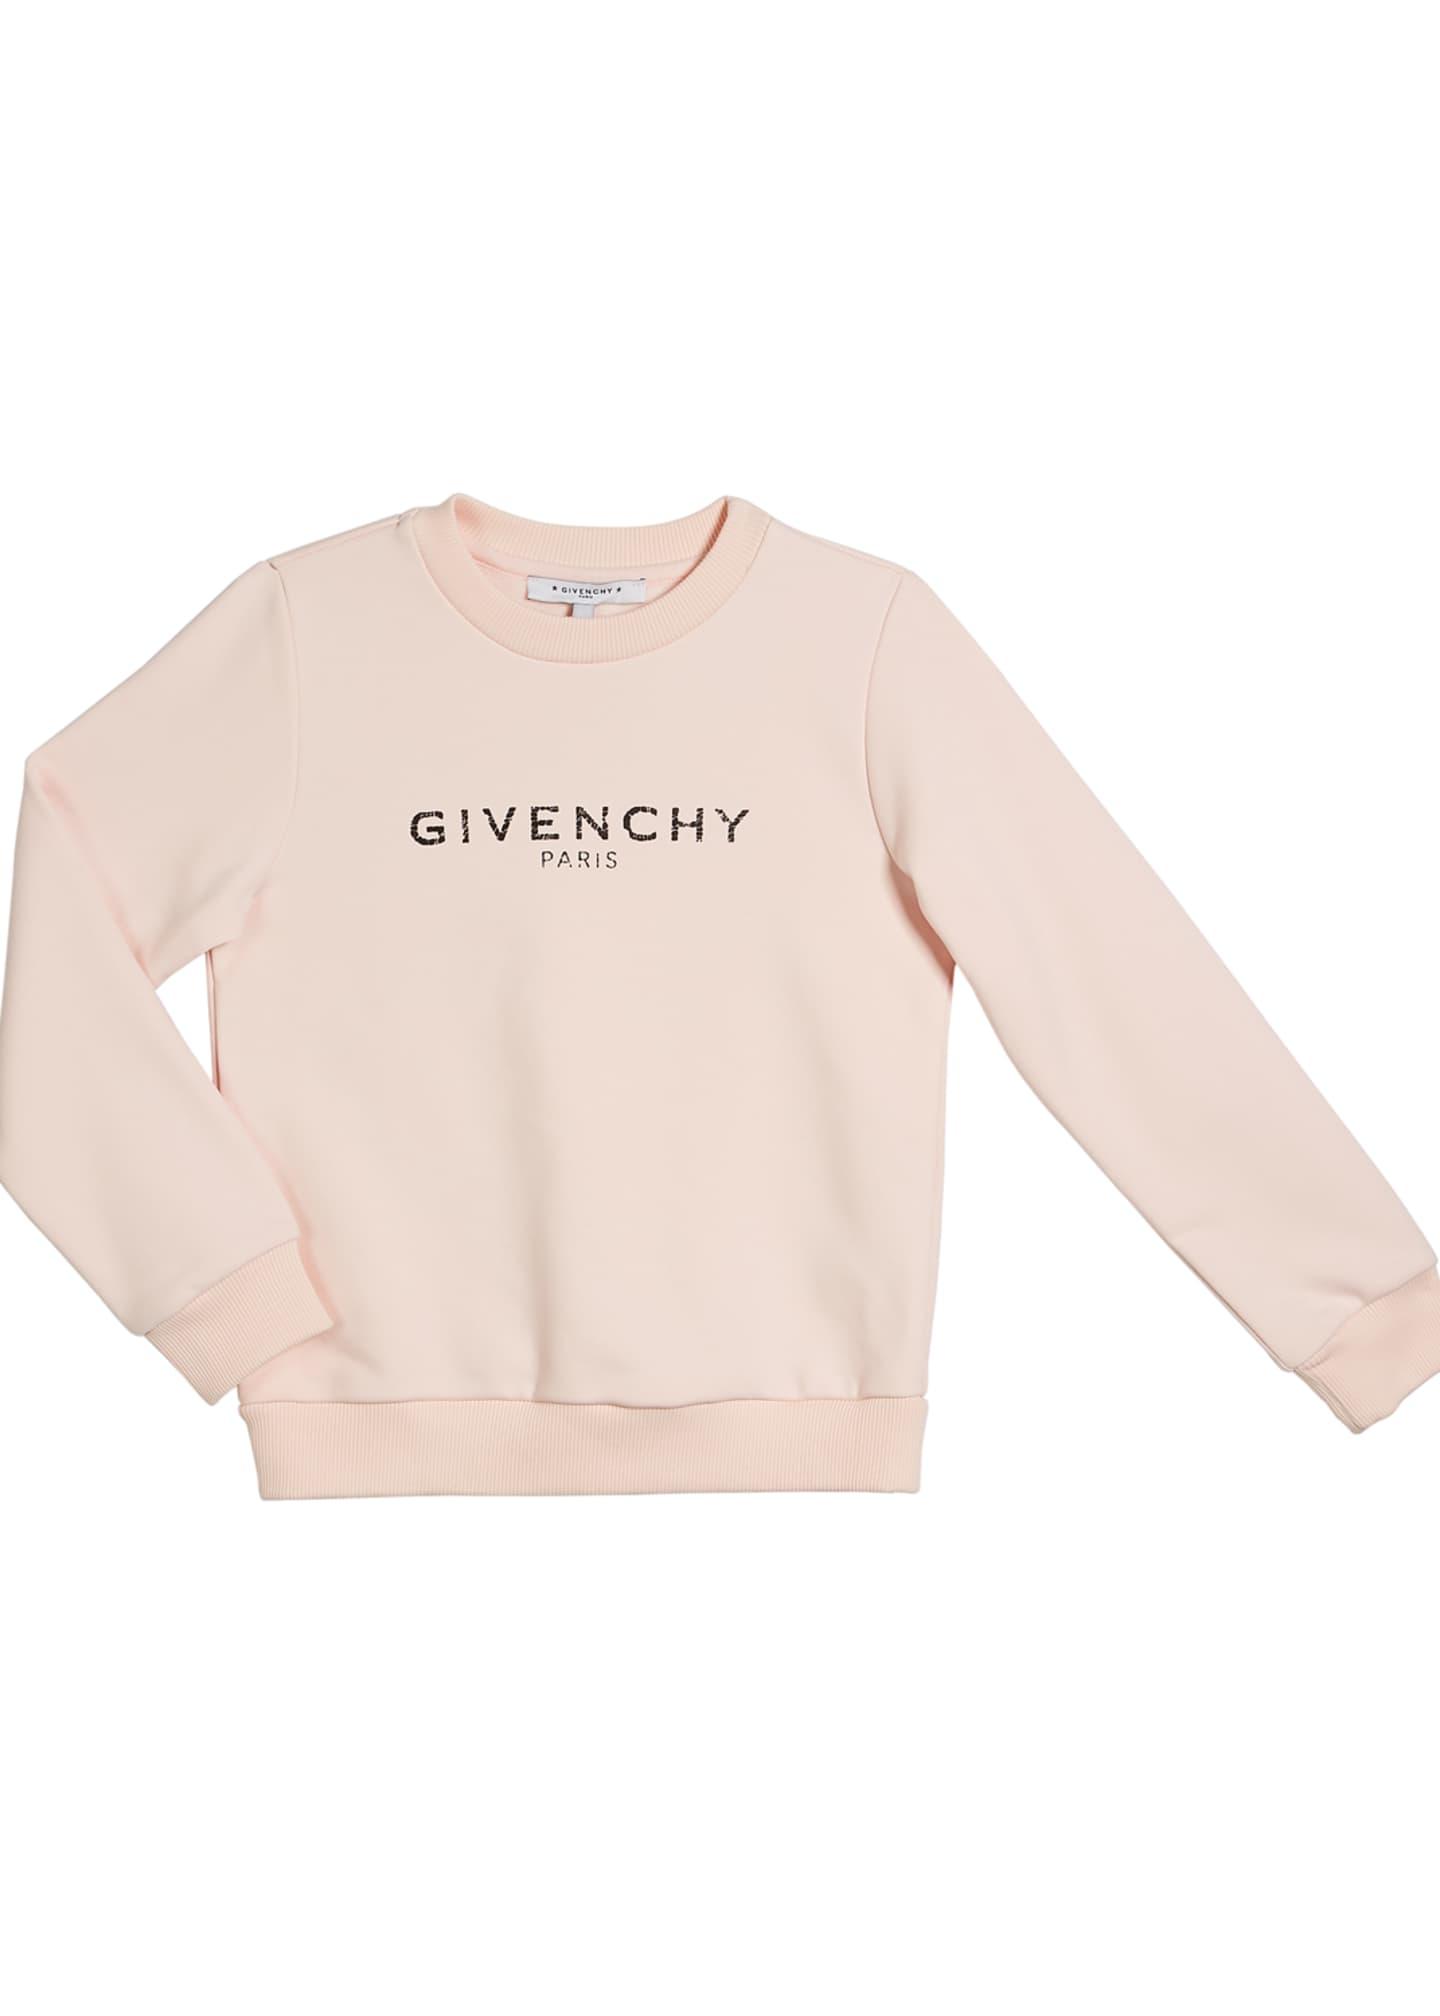 Givenchy Girl's Logo Sweatshirt, Size 4-10